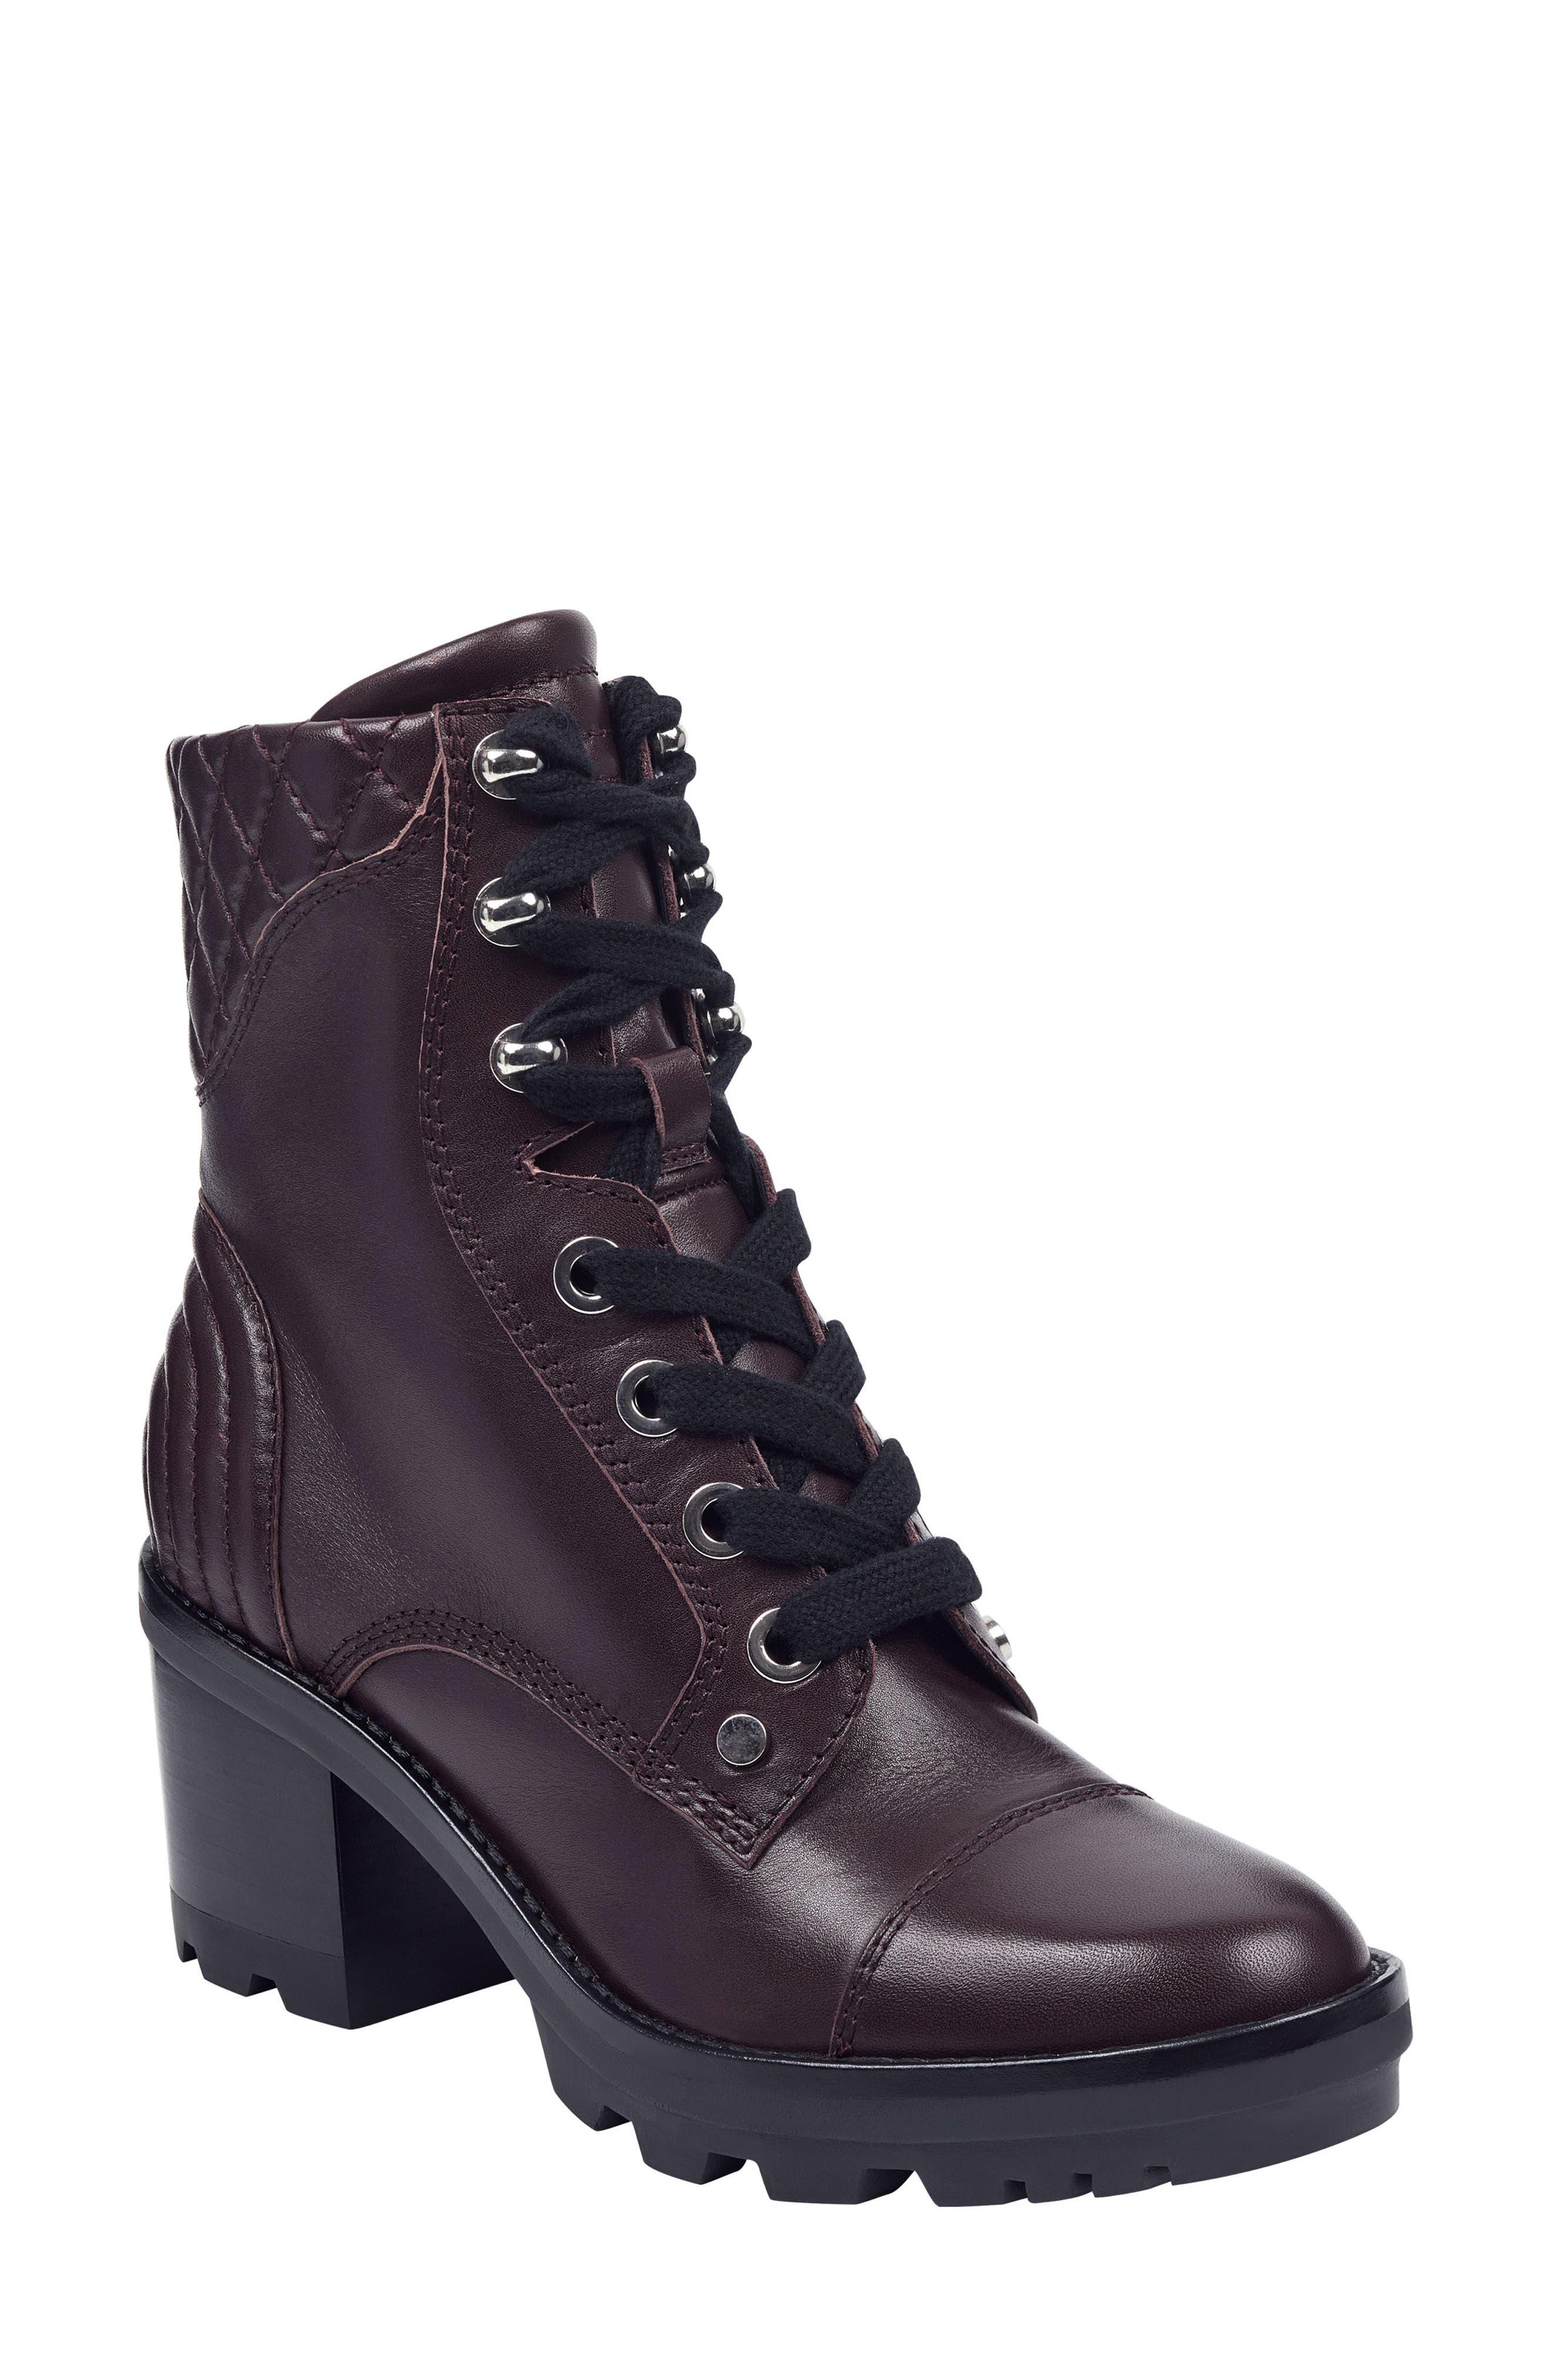 Marc Fisher Ltd Wyomi Platform Boot- Burgundy